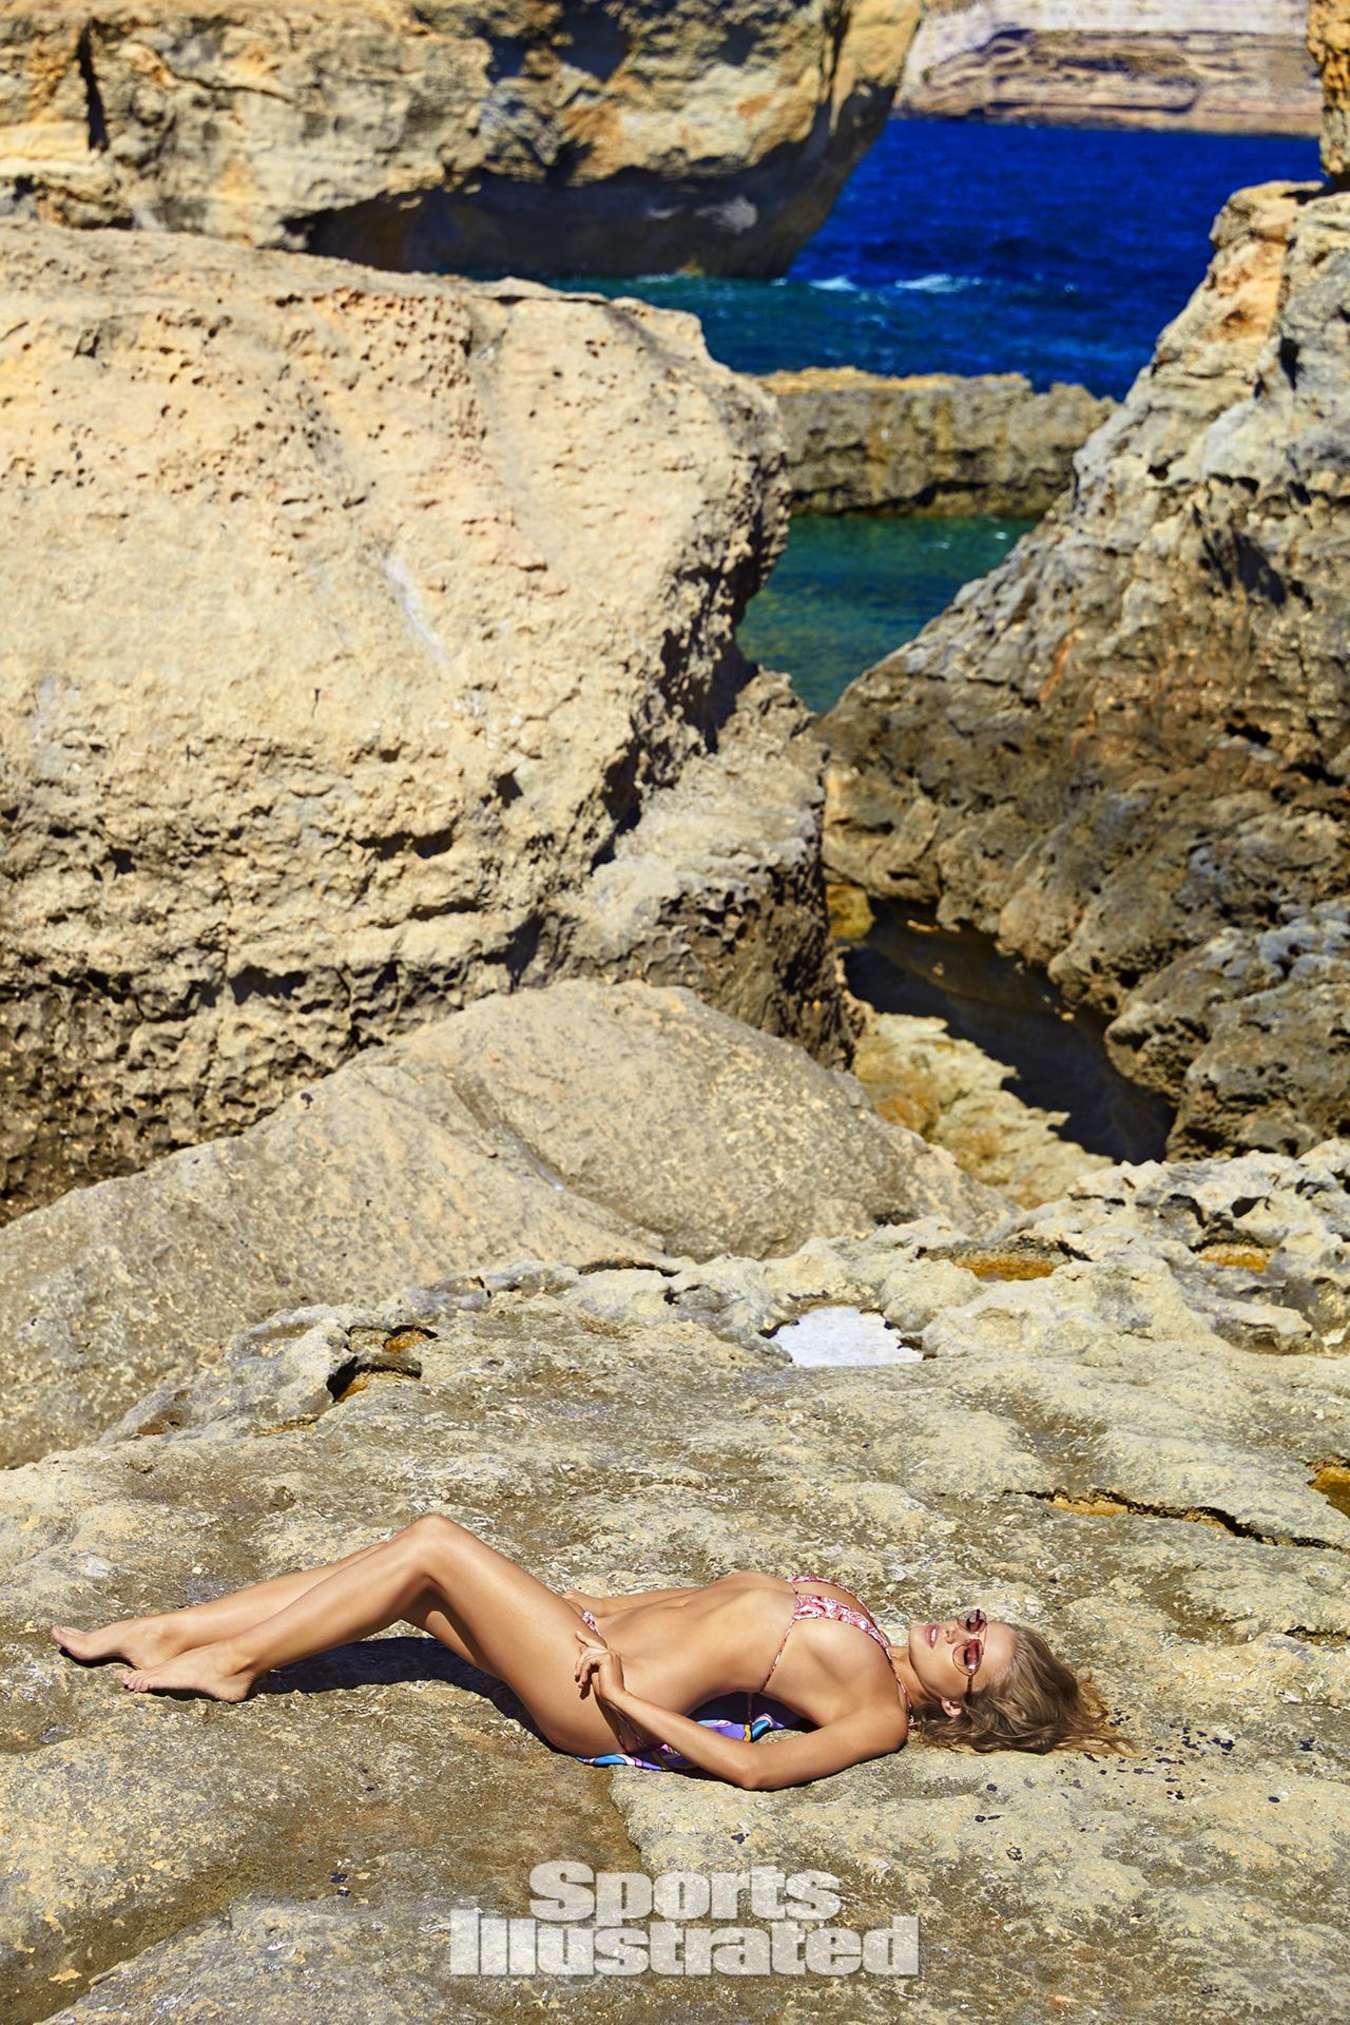 Tanya Mityushina Sports Illustrated Swimsuit Edition